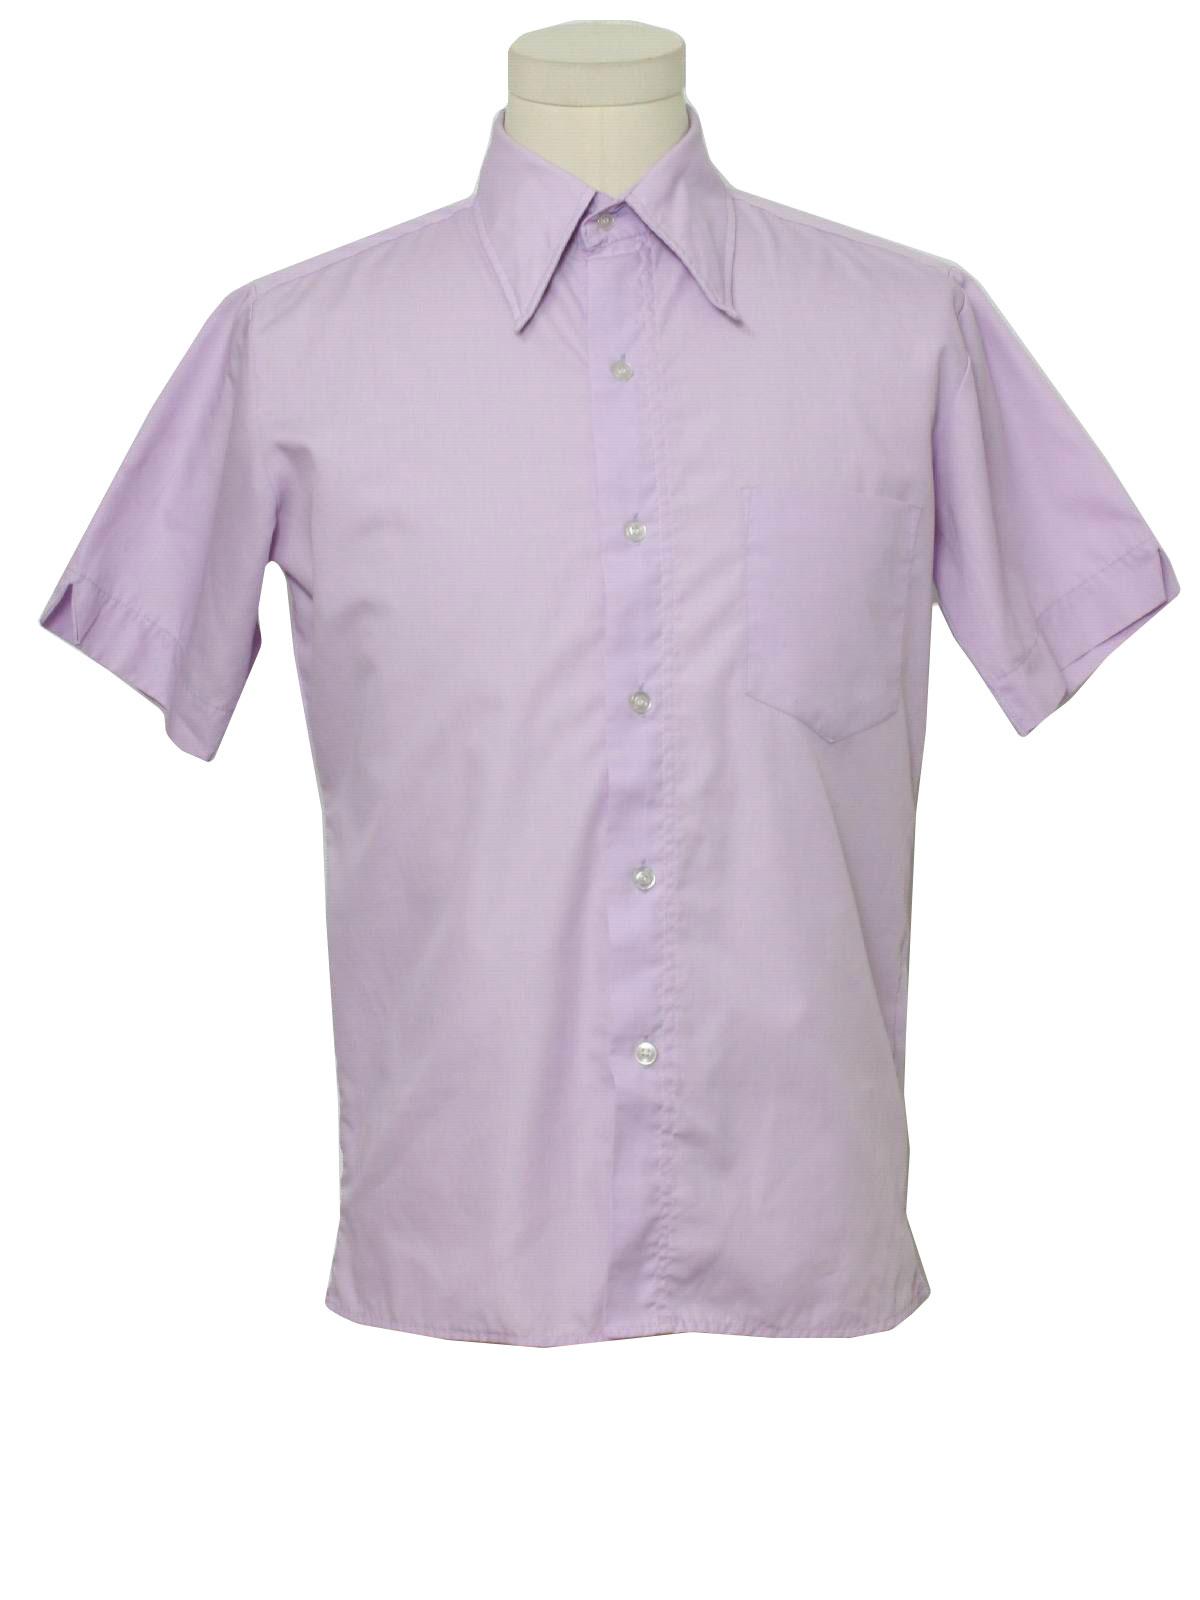 Mens Dress Shirt Measurements Chest Joe Maloy